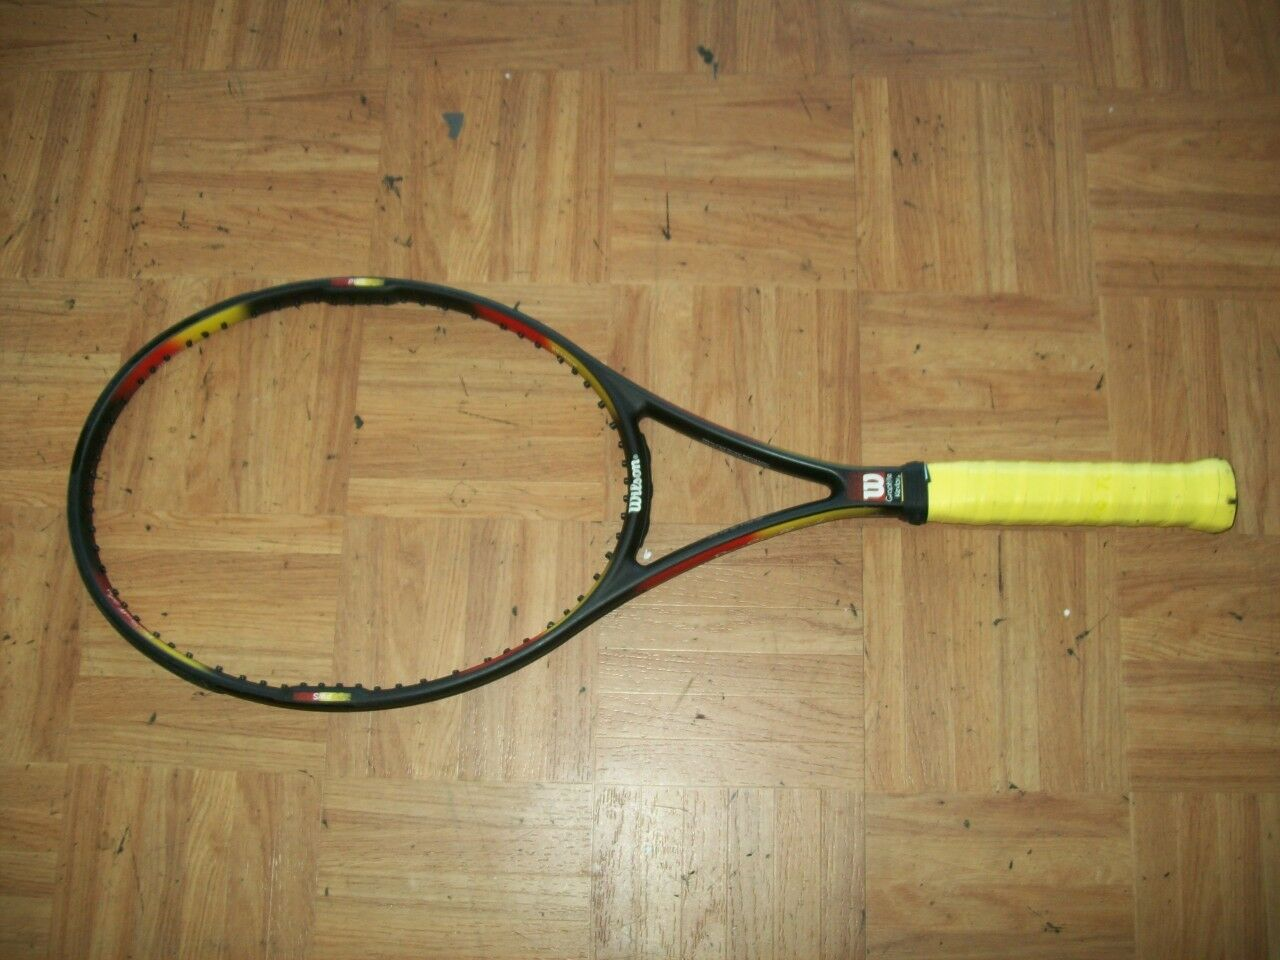 Wilson Pro Staff Clásico si 6.1 95 cabeza 4 1 2 Grip Tenis Raqueta